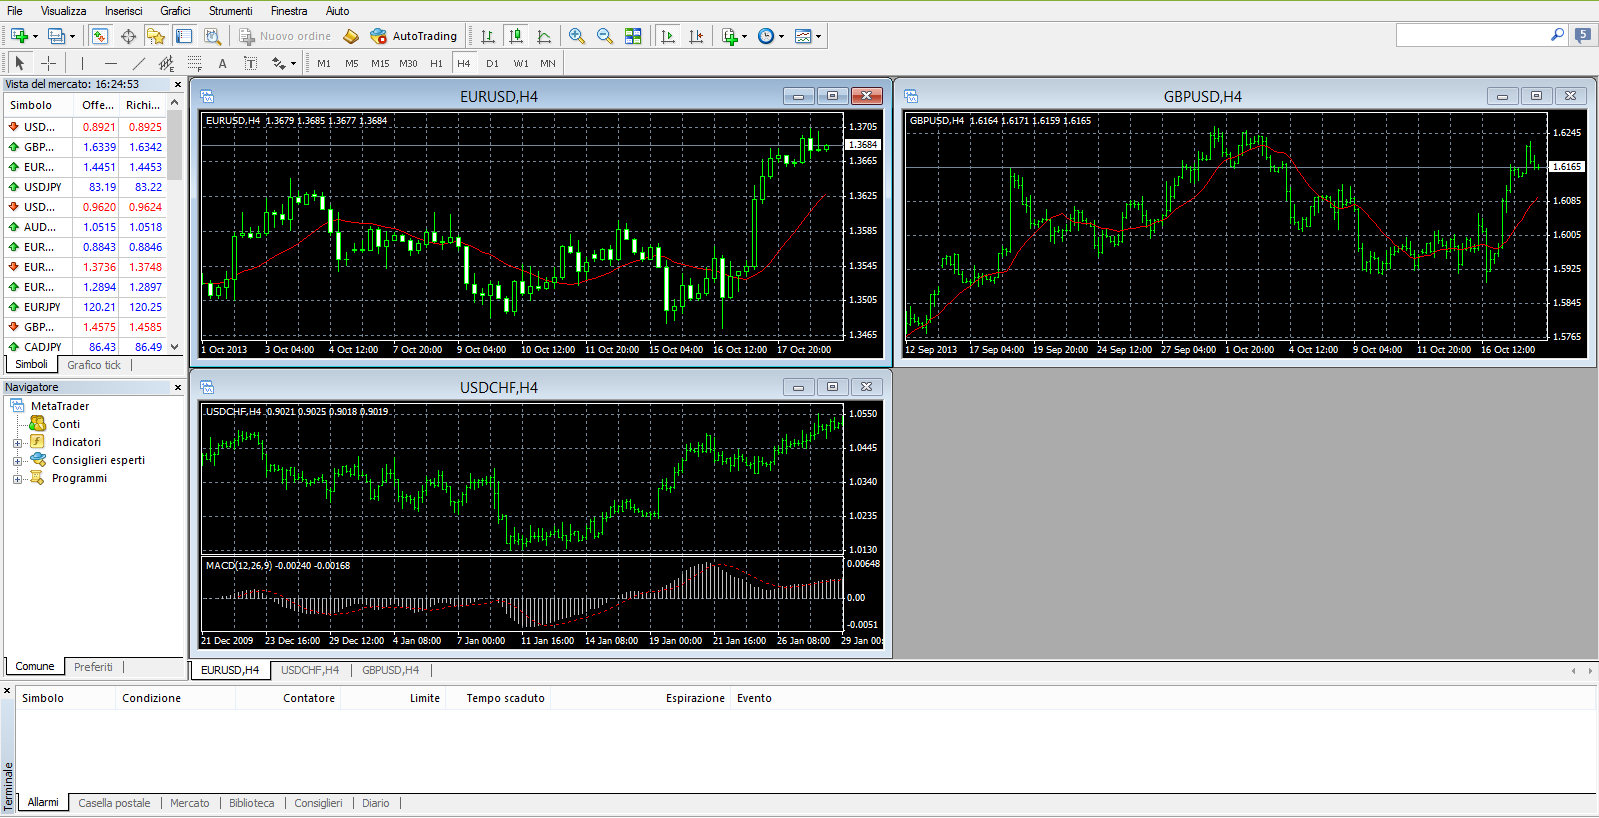 Display della piattaforma di trading Metatrader 4